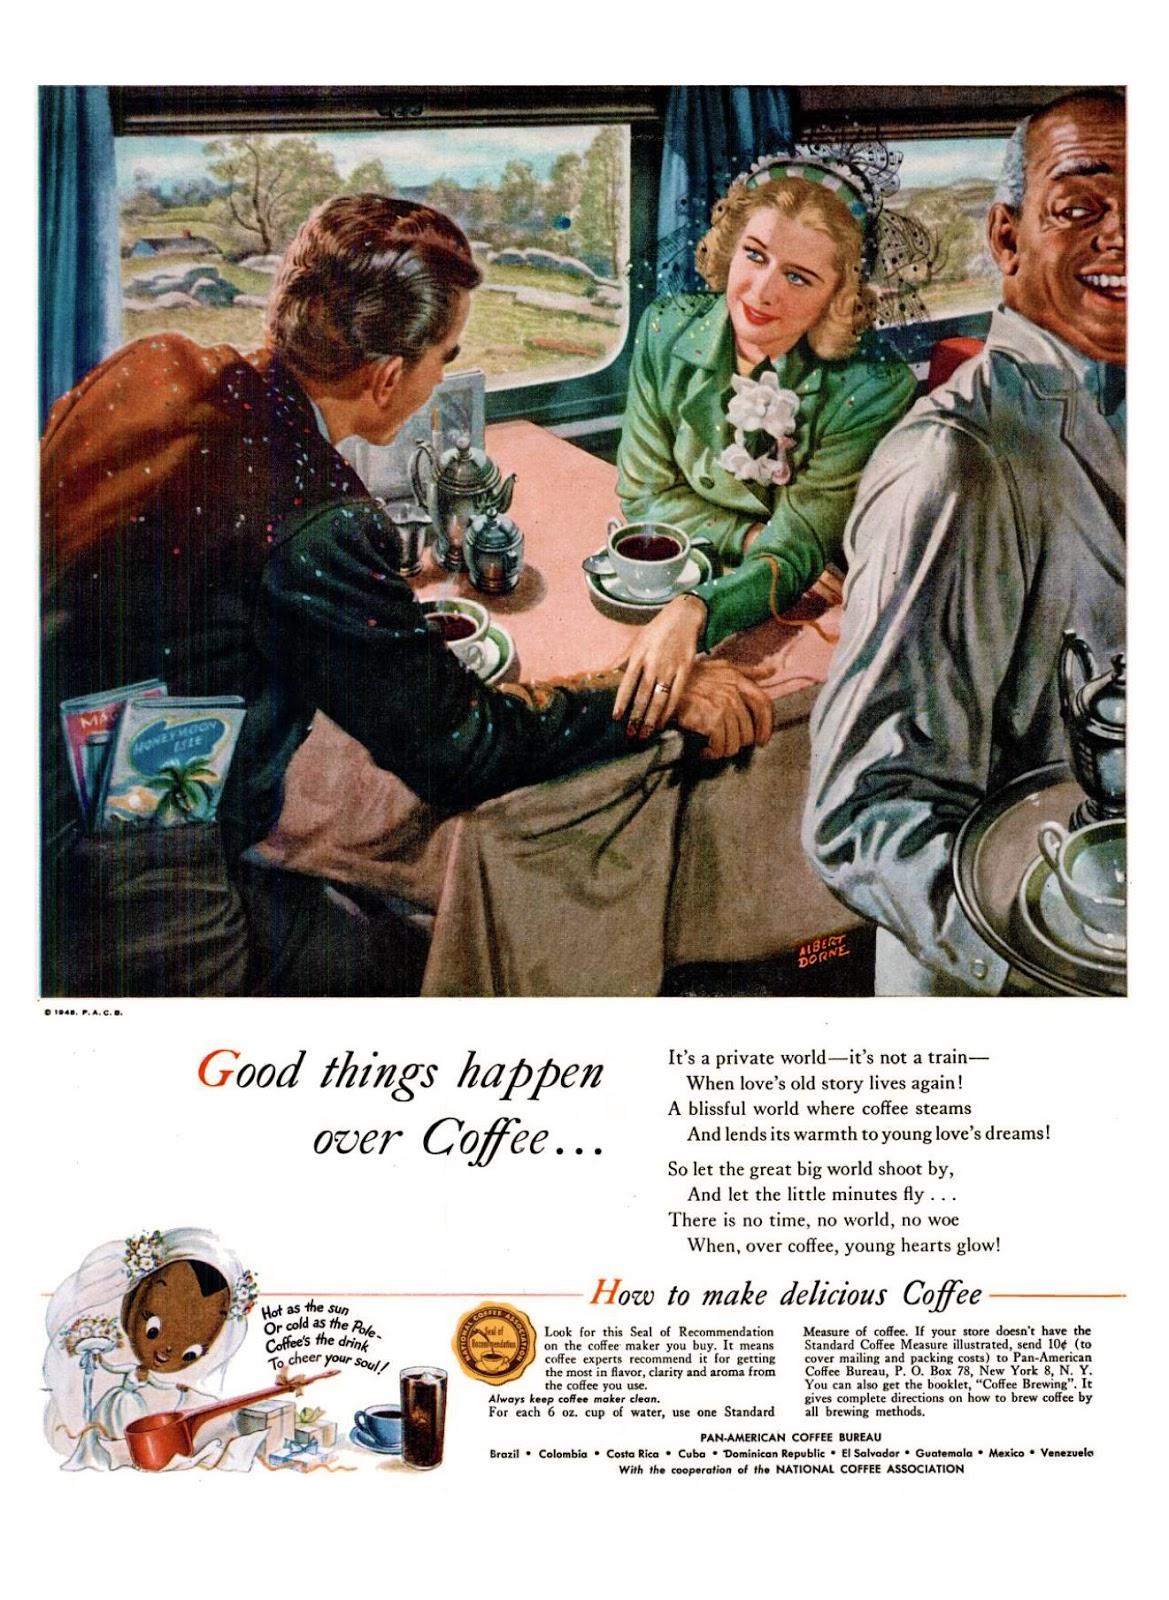 1948-7 Pan-American Coffee Bureau LIFE LIFE Jun 7, 1948 ~ Albert Dorne.jpeg